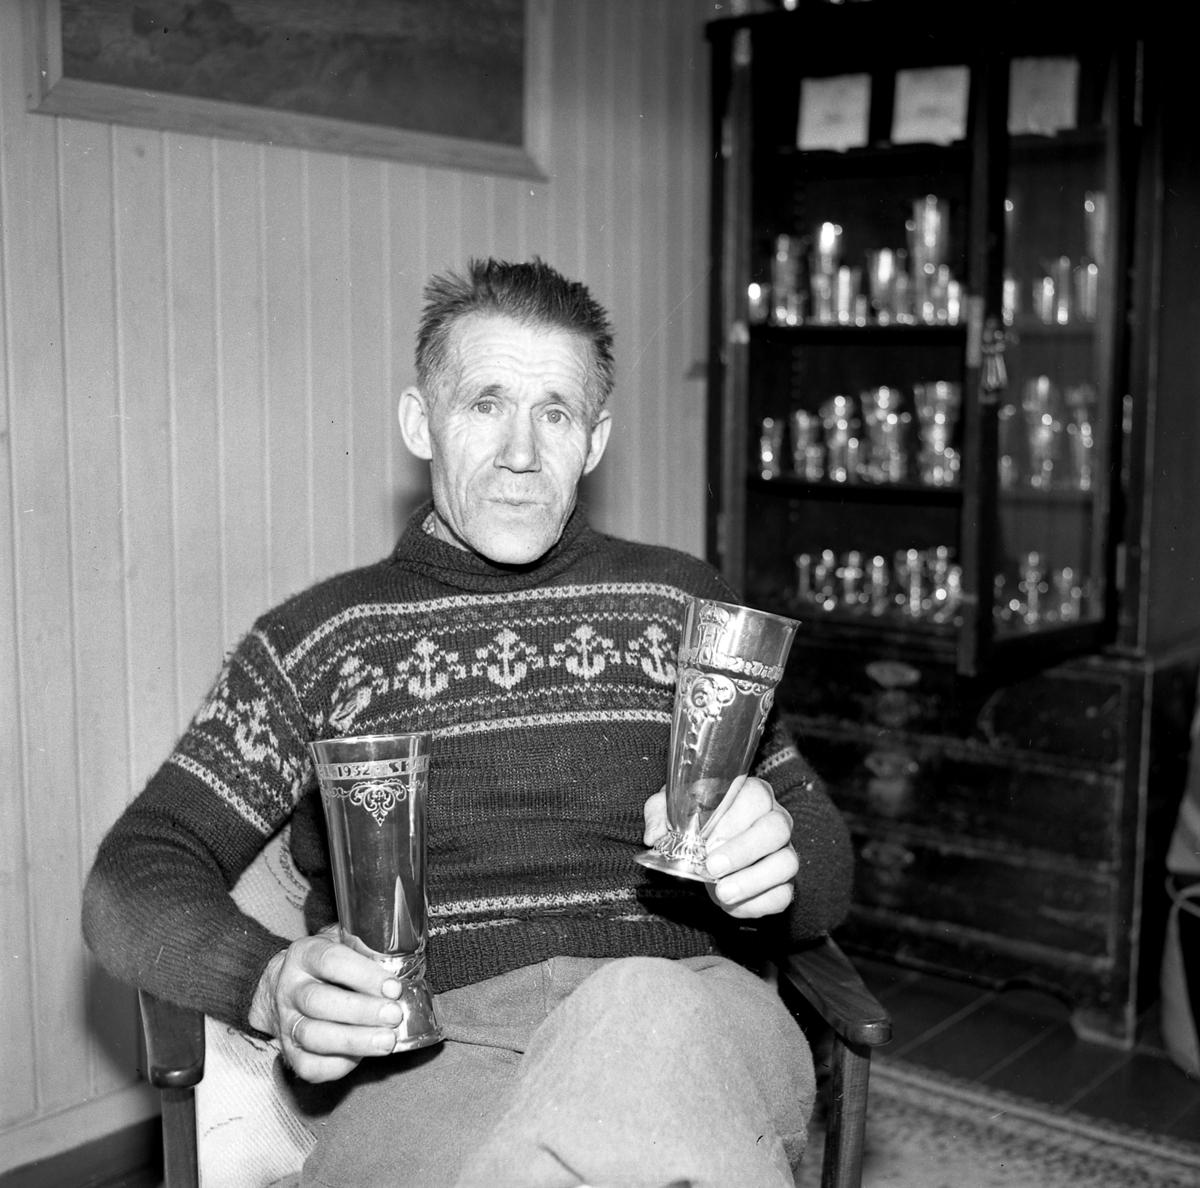 Gjermund Muruåsen